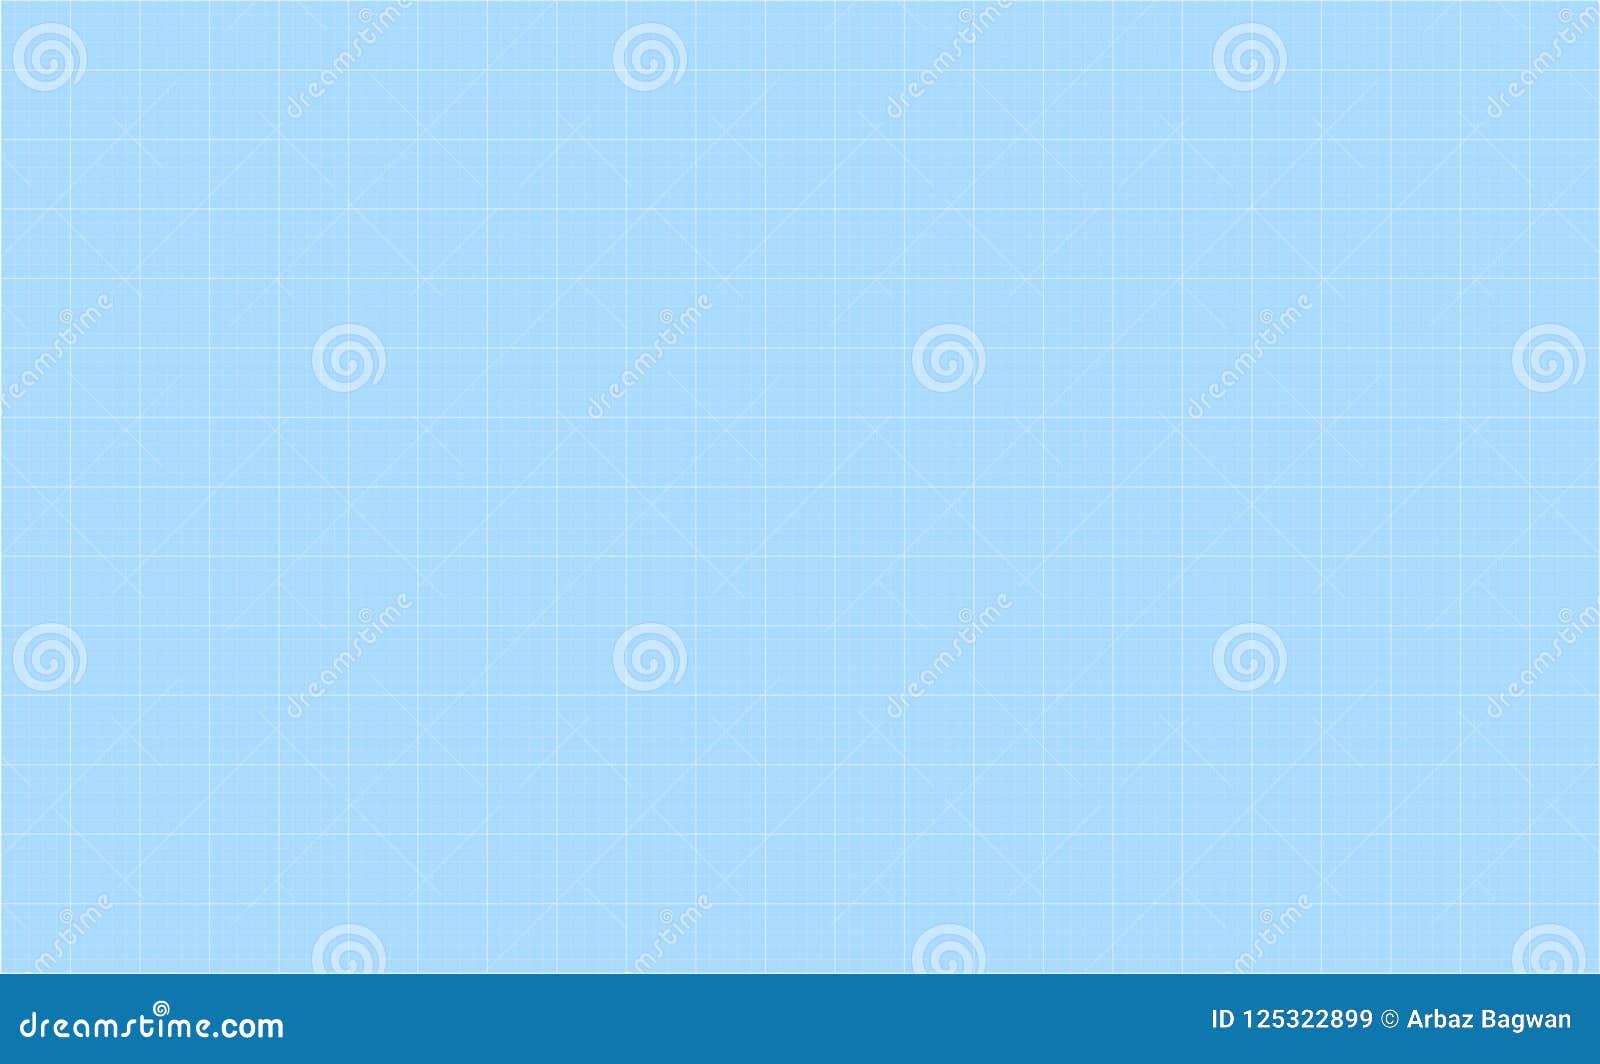 grid graph paper light blue stock vector illustration of draftsman